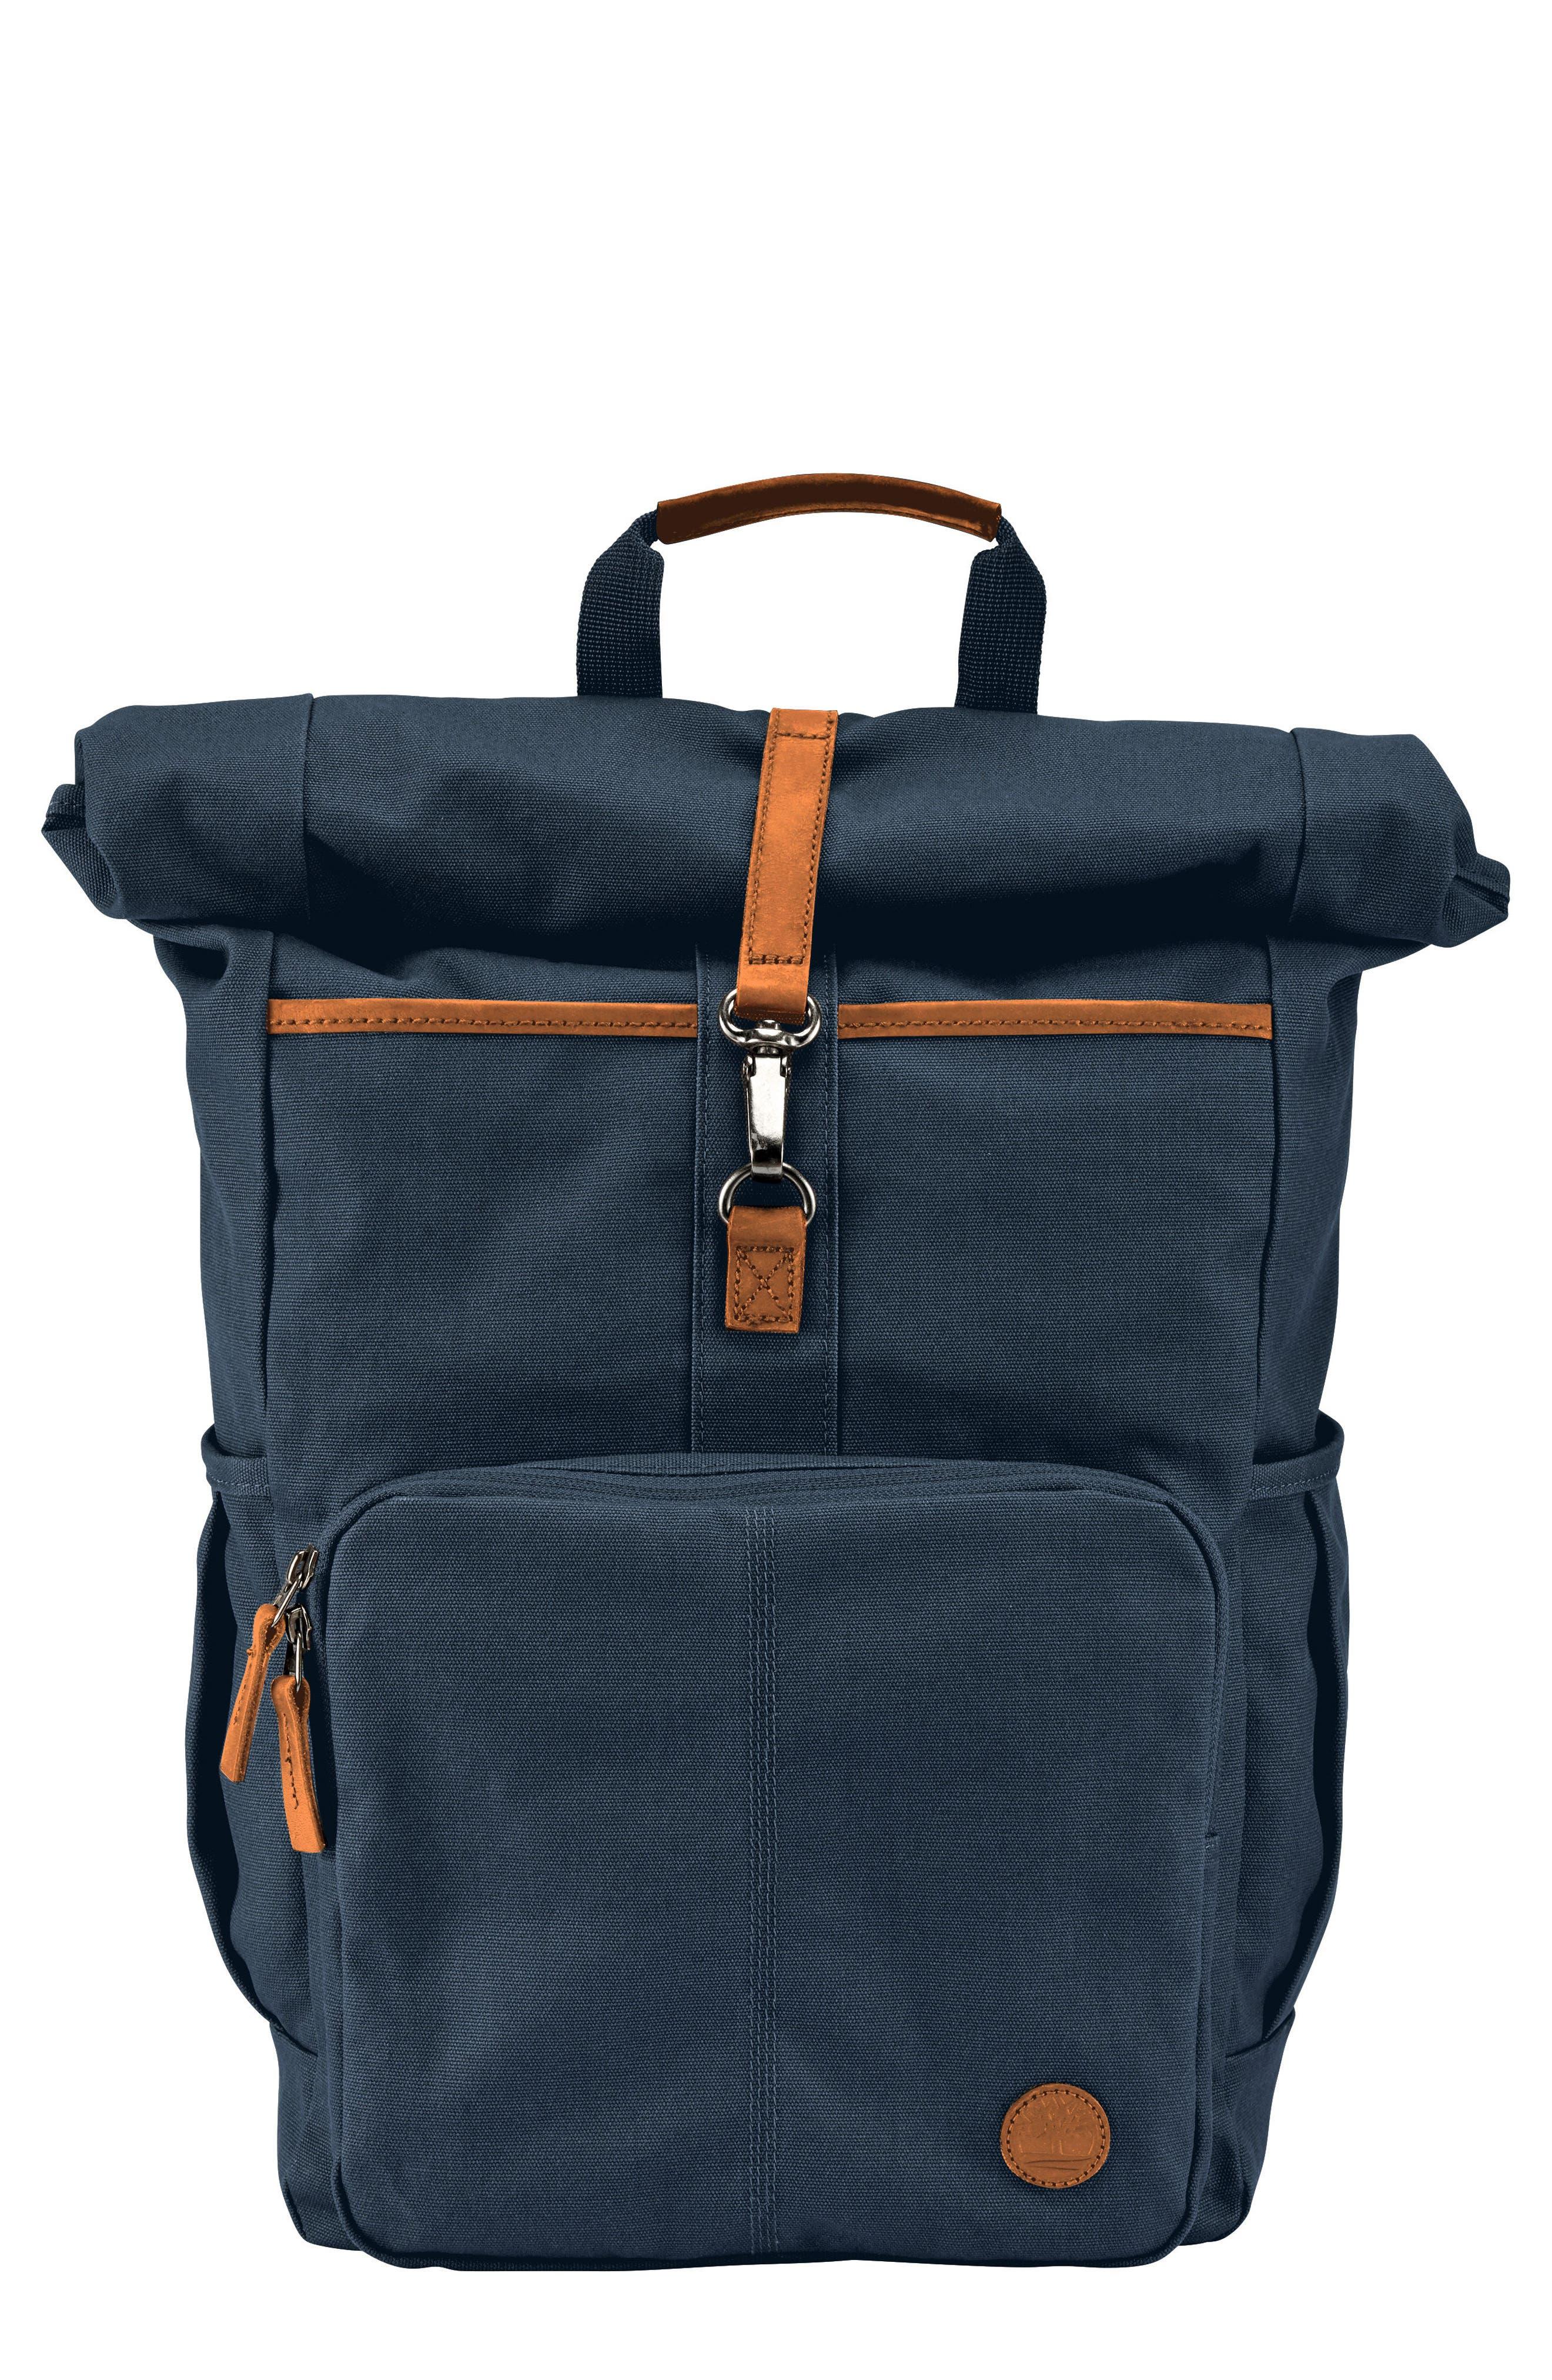 TIMBERLAND Walnut Hill Rolltop Backpack